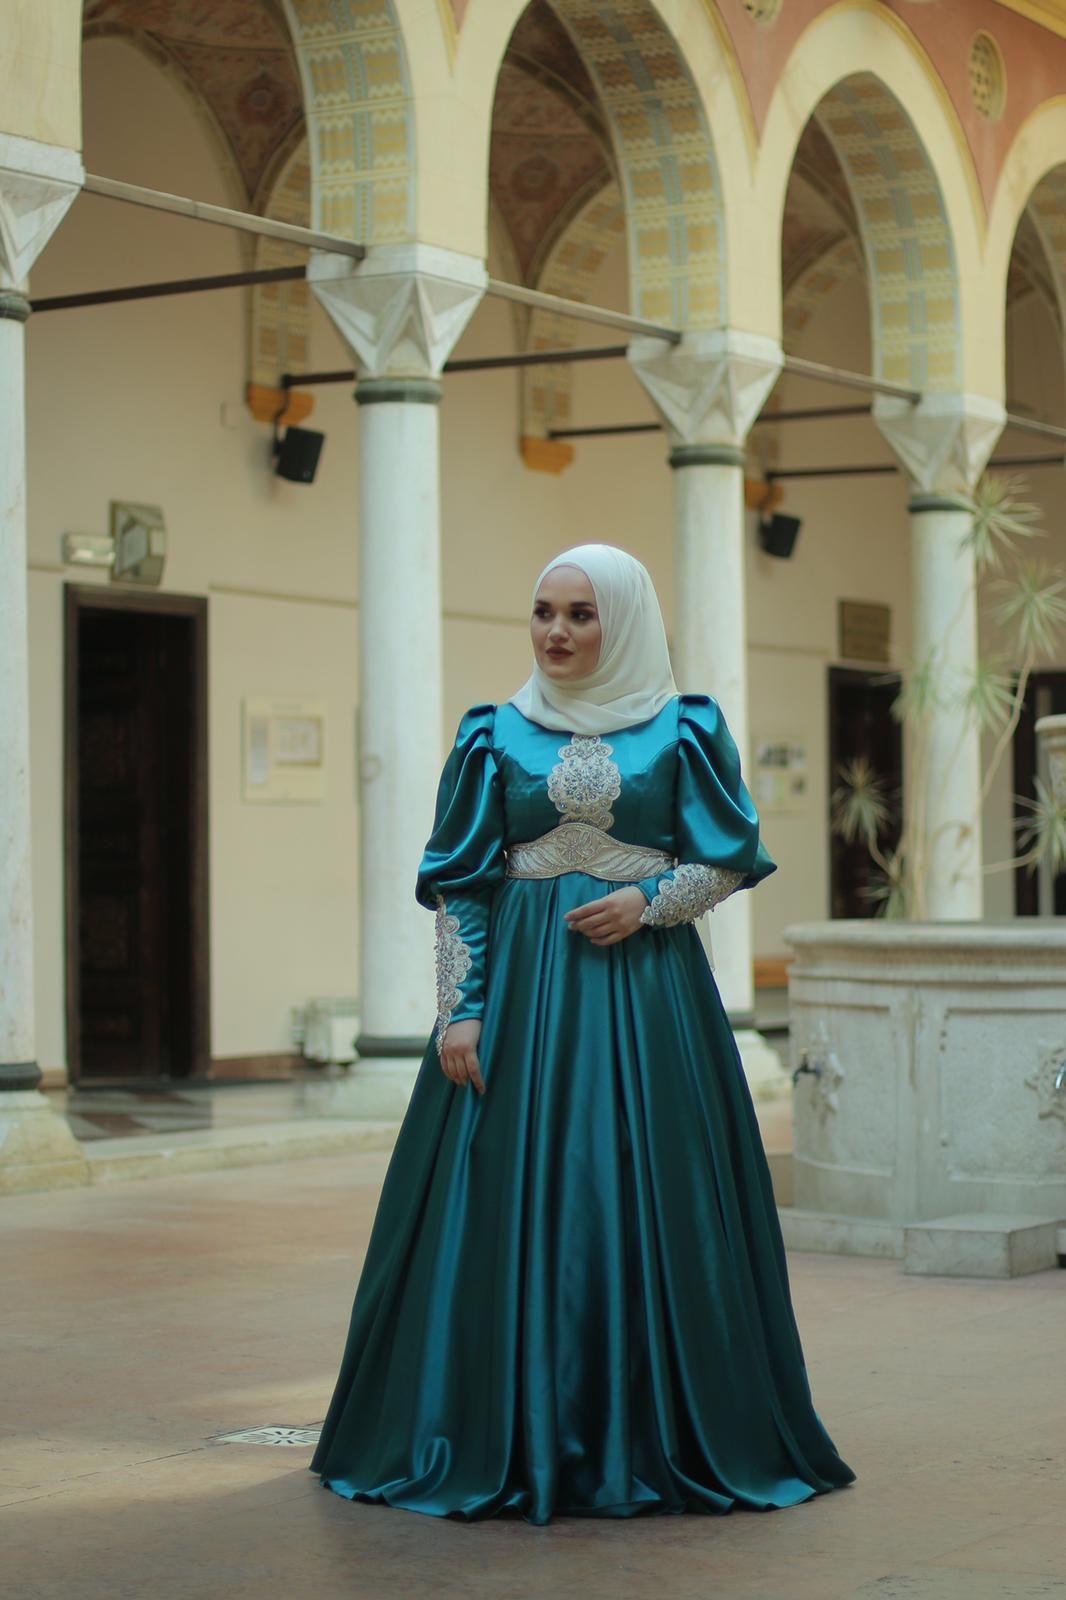 Pin On Unikatne Svecane Haljine By Selma Hasic Manic Dresses